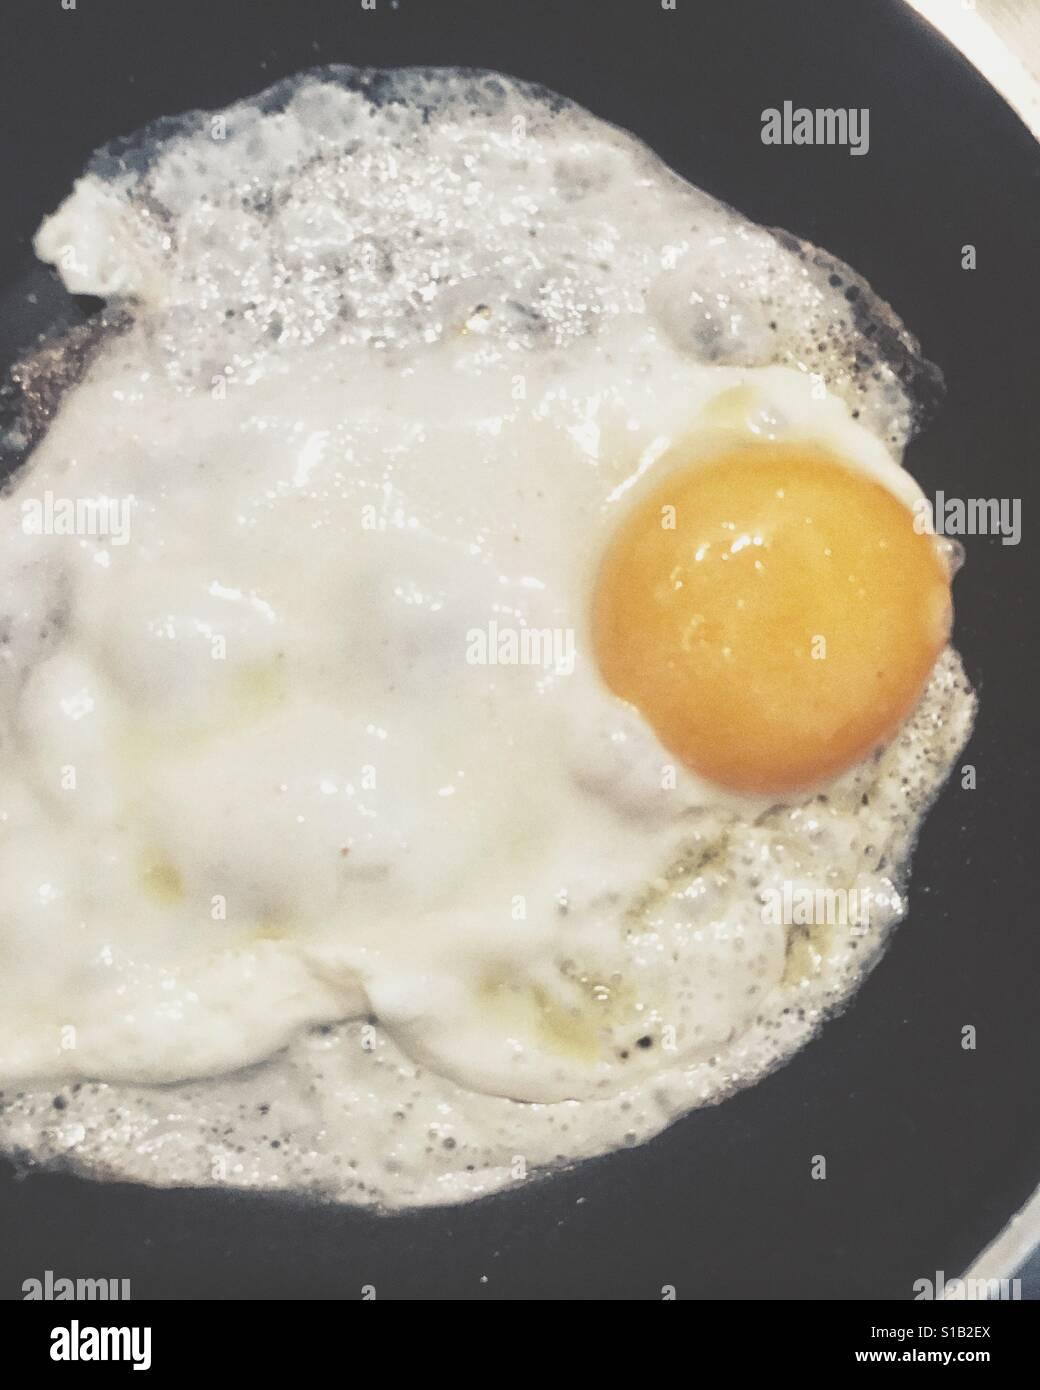 Fried egg - Stock Image